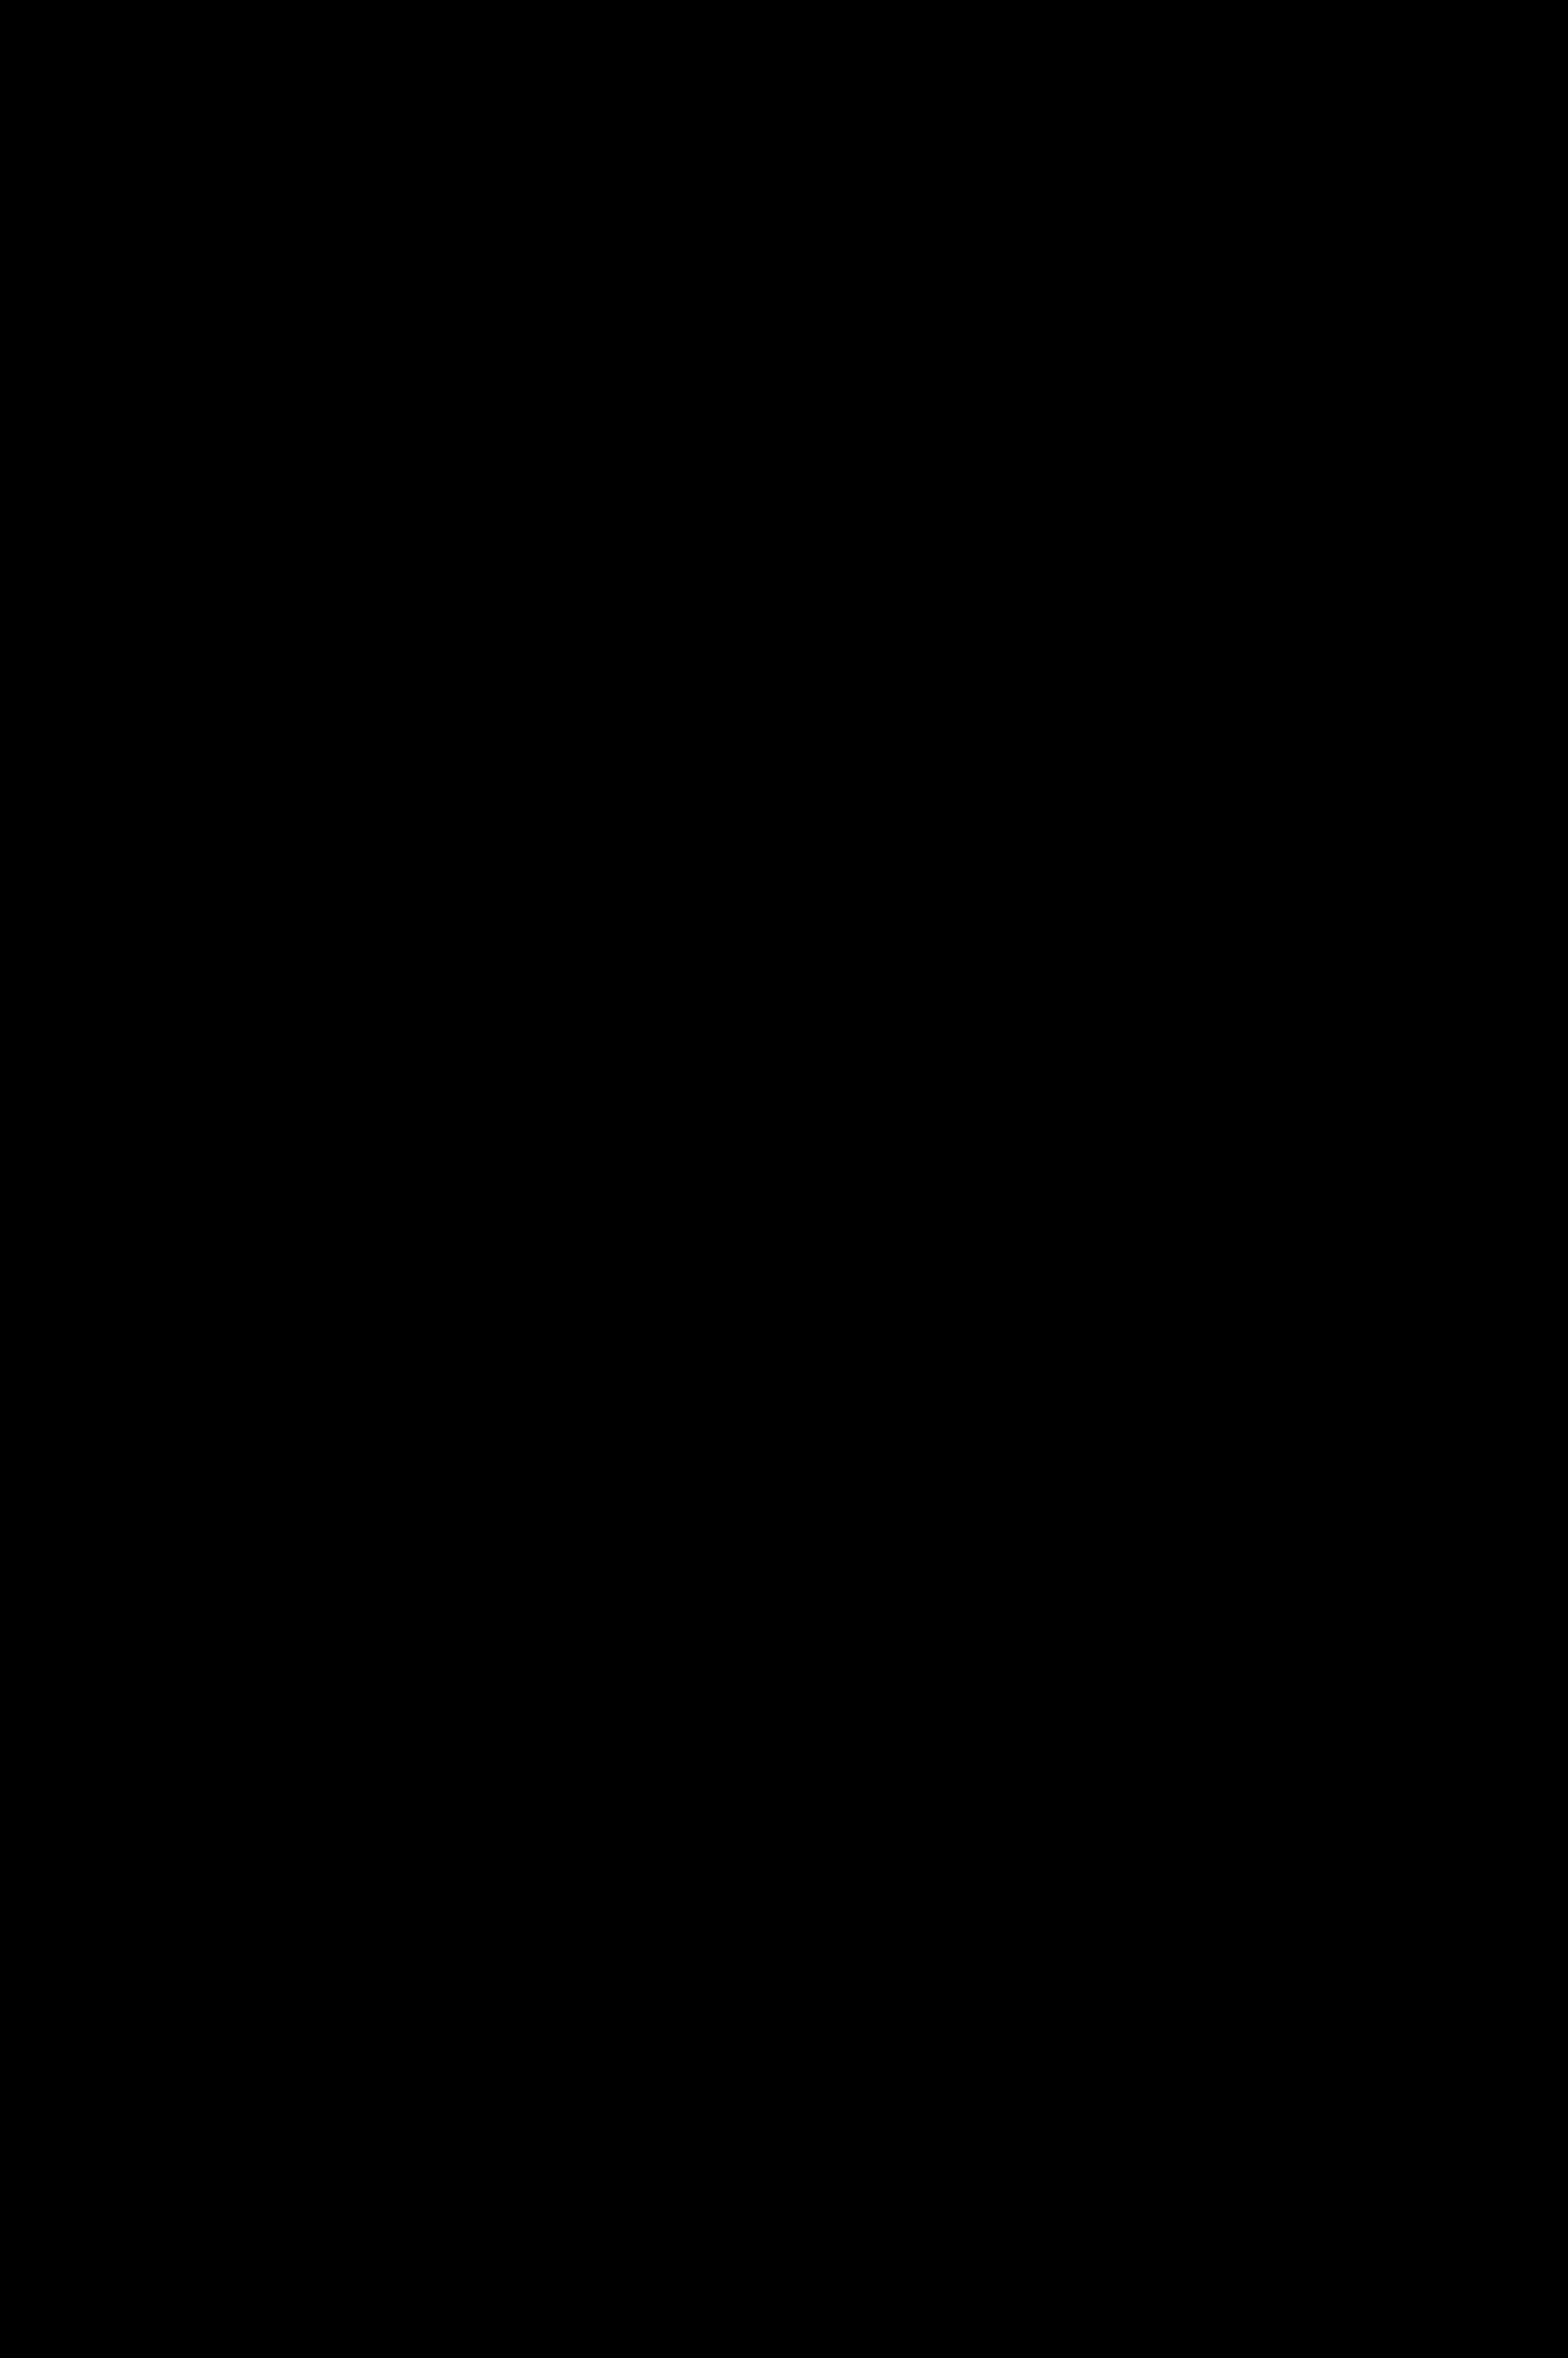 Diamondback Snake Clipart 20 Free Cliparts